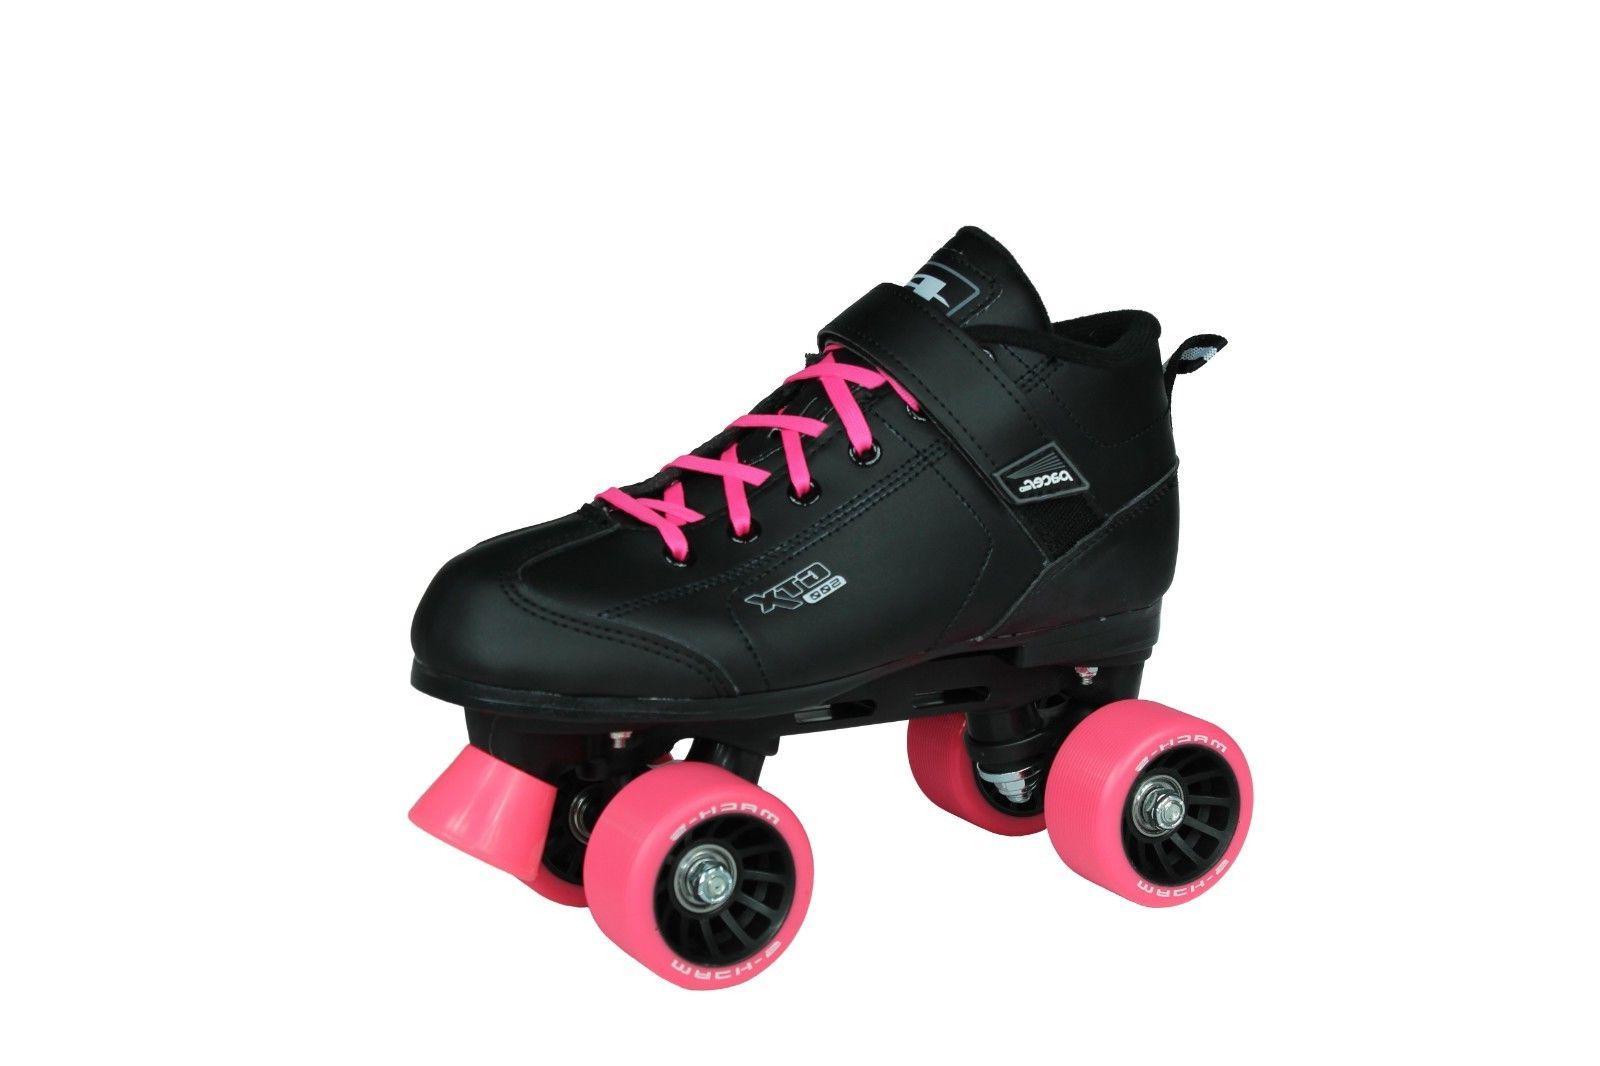 NEW! Pacer Mach-5 Black & Pink Quad Roller Speed Bundle